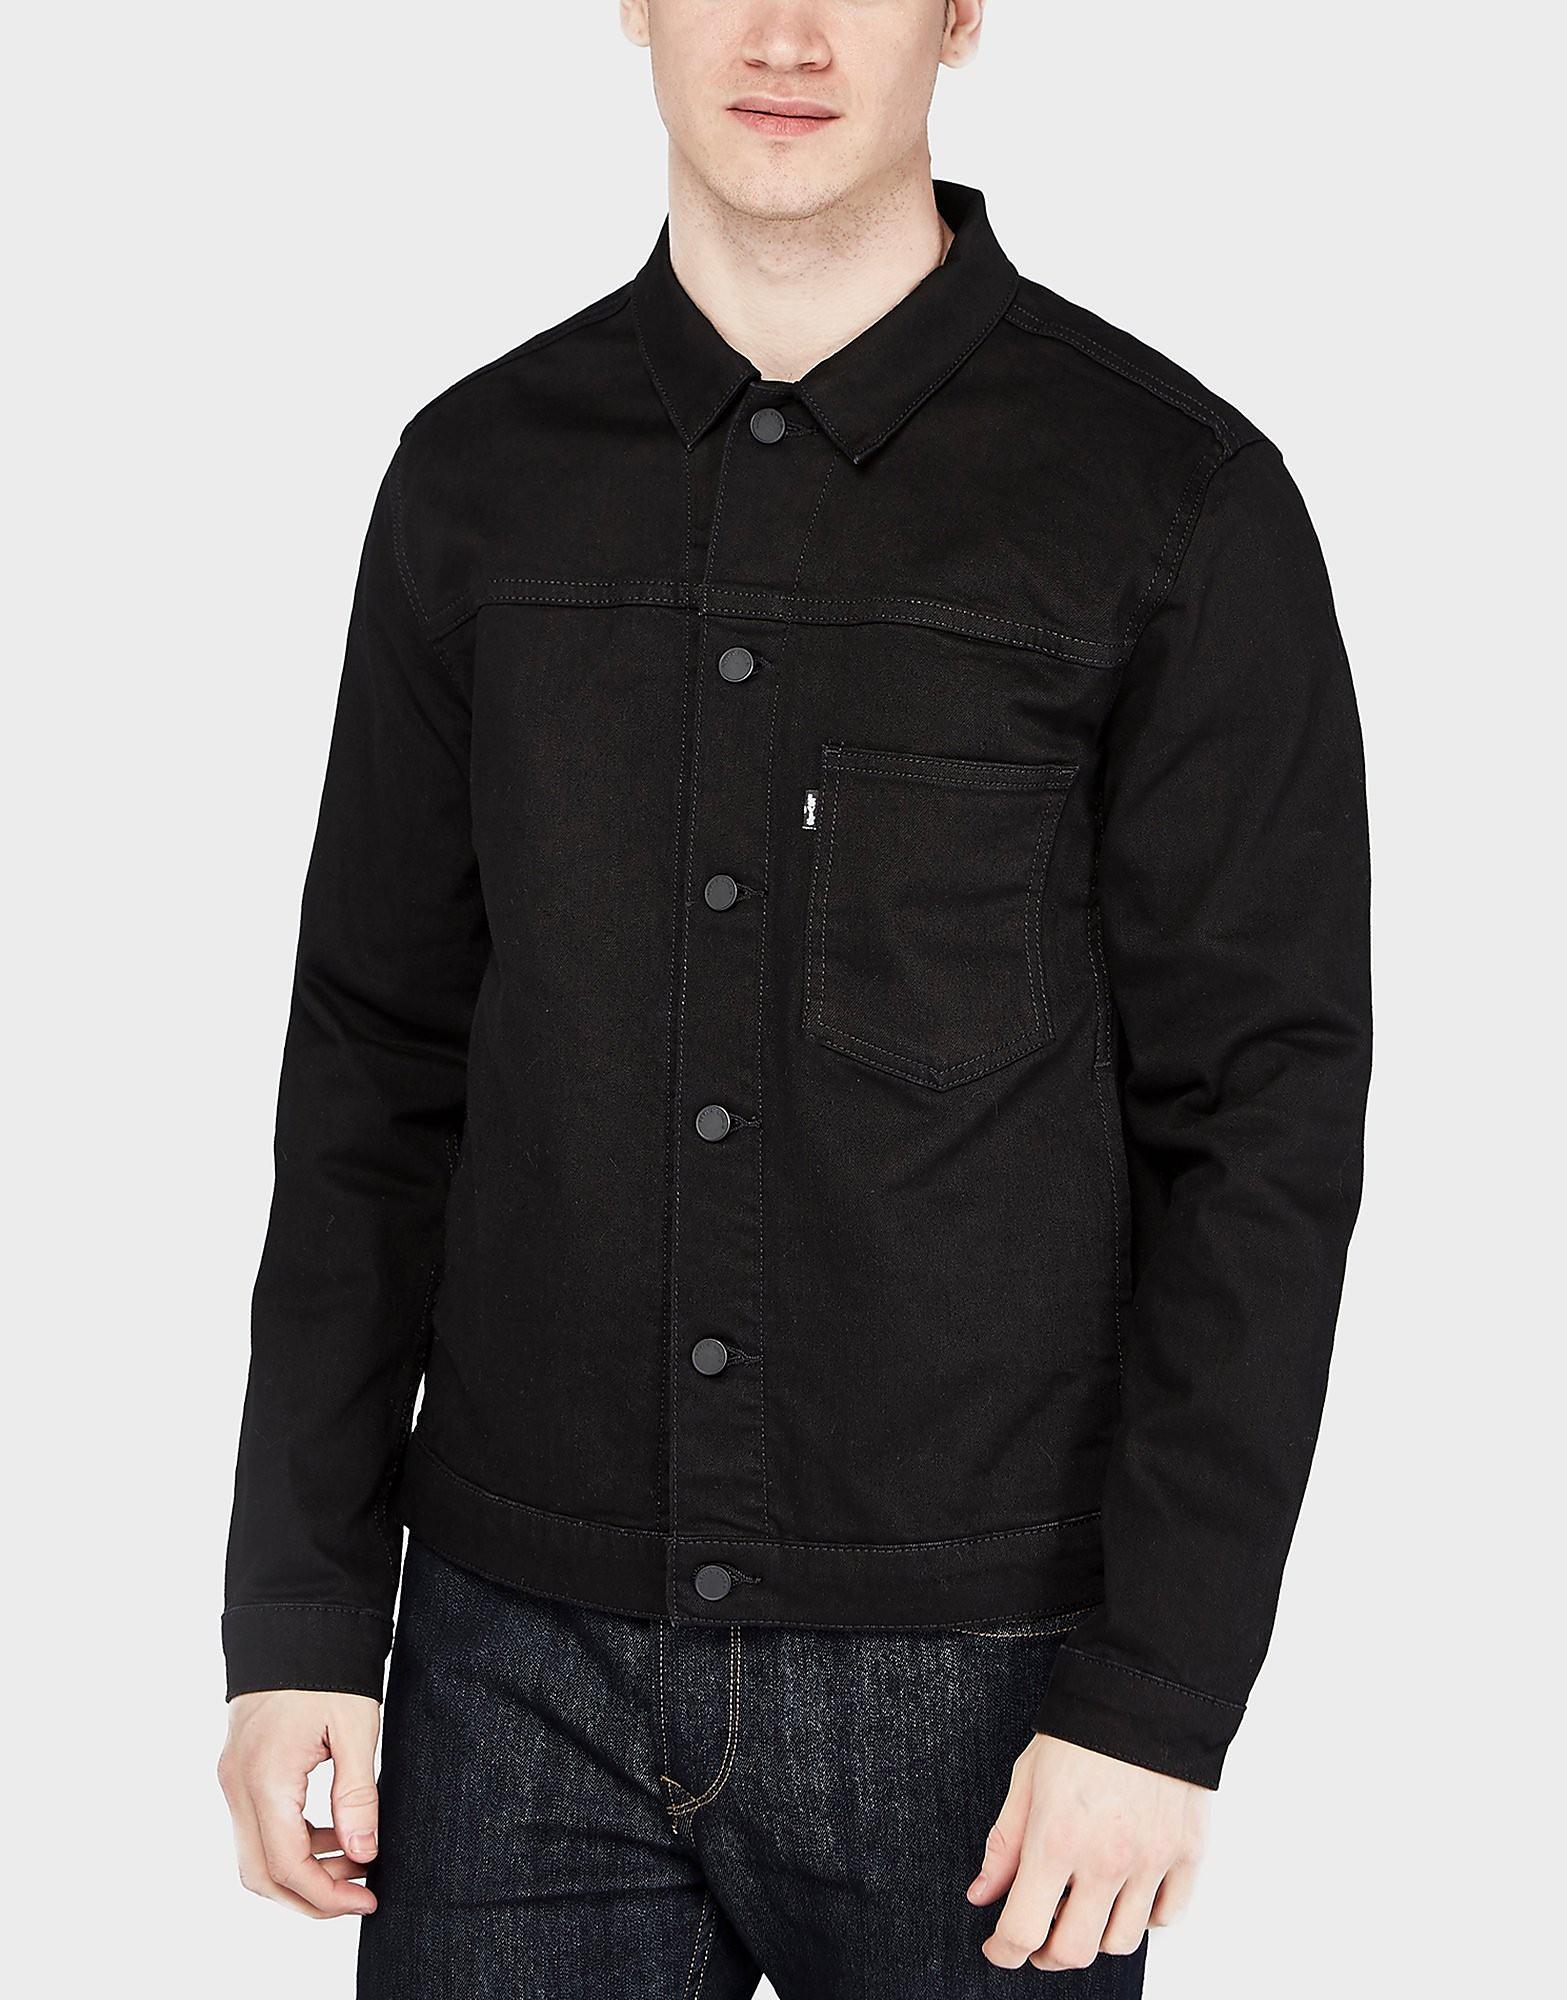 Levis Trucker Lightweight Jacket